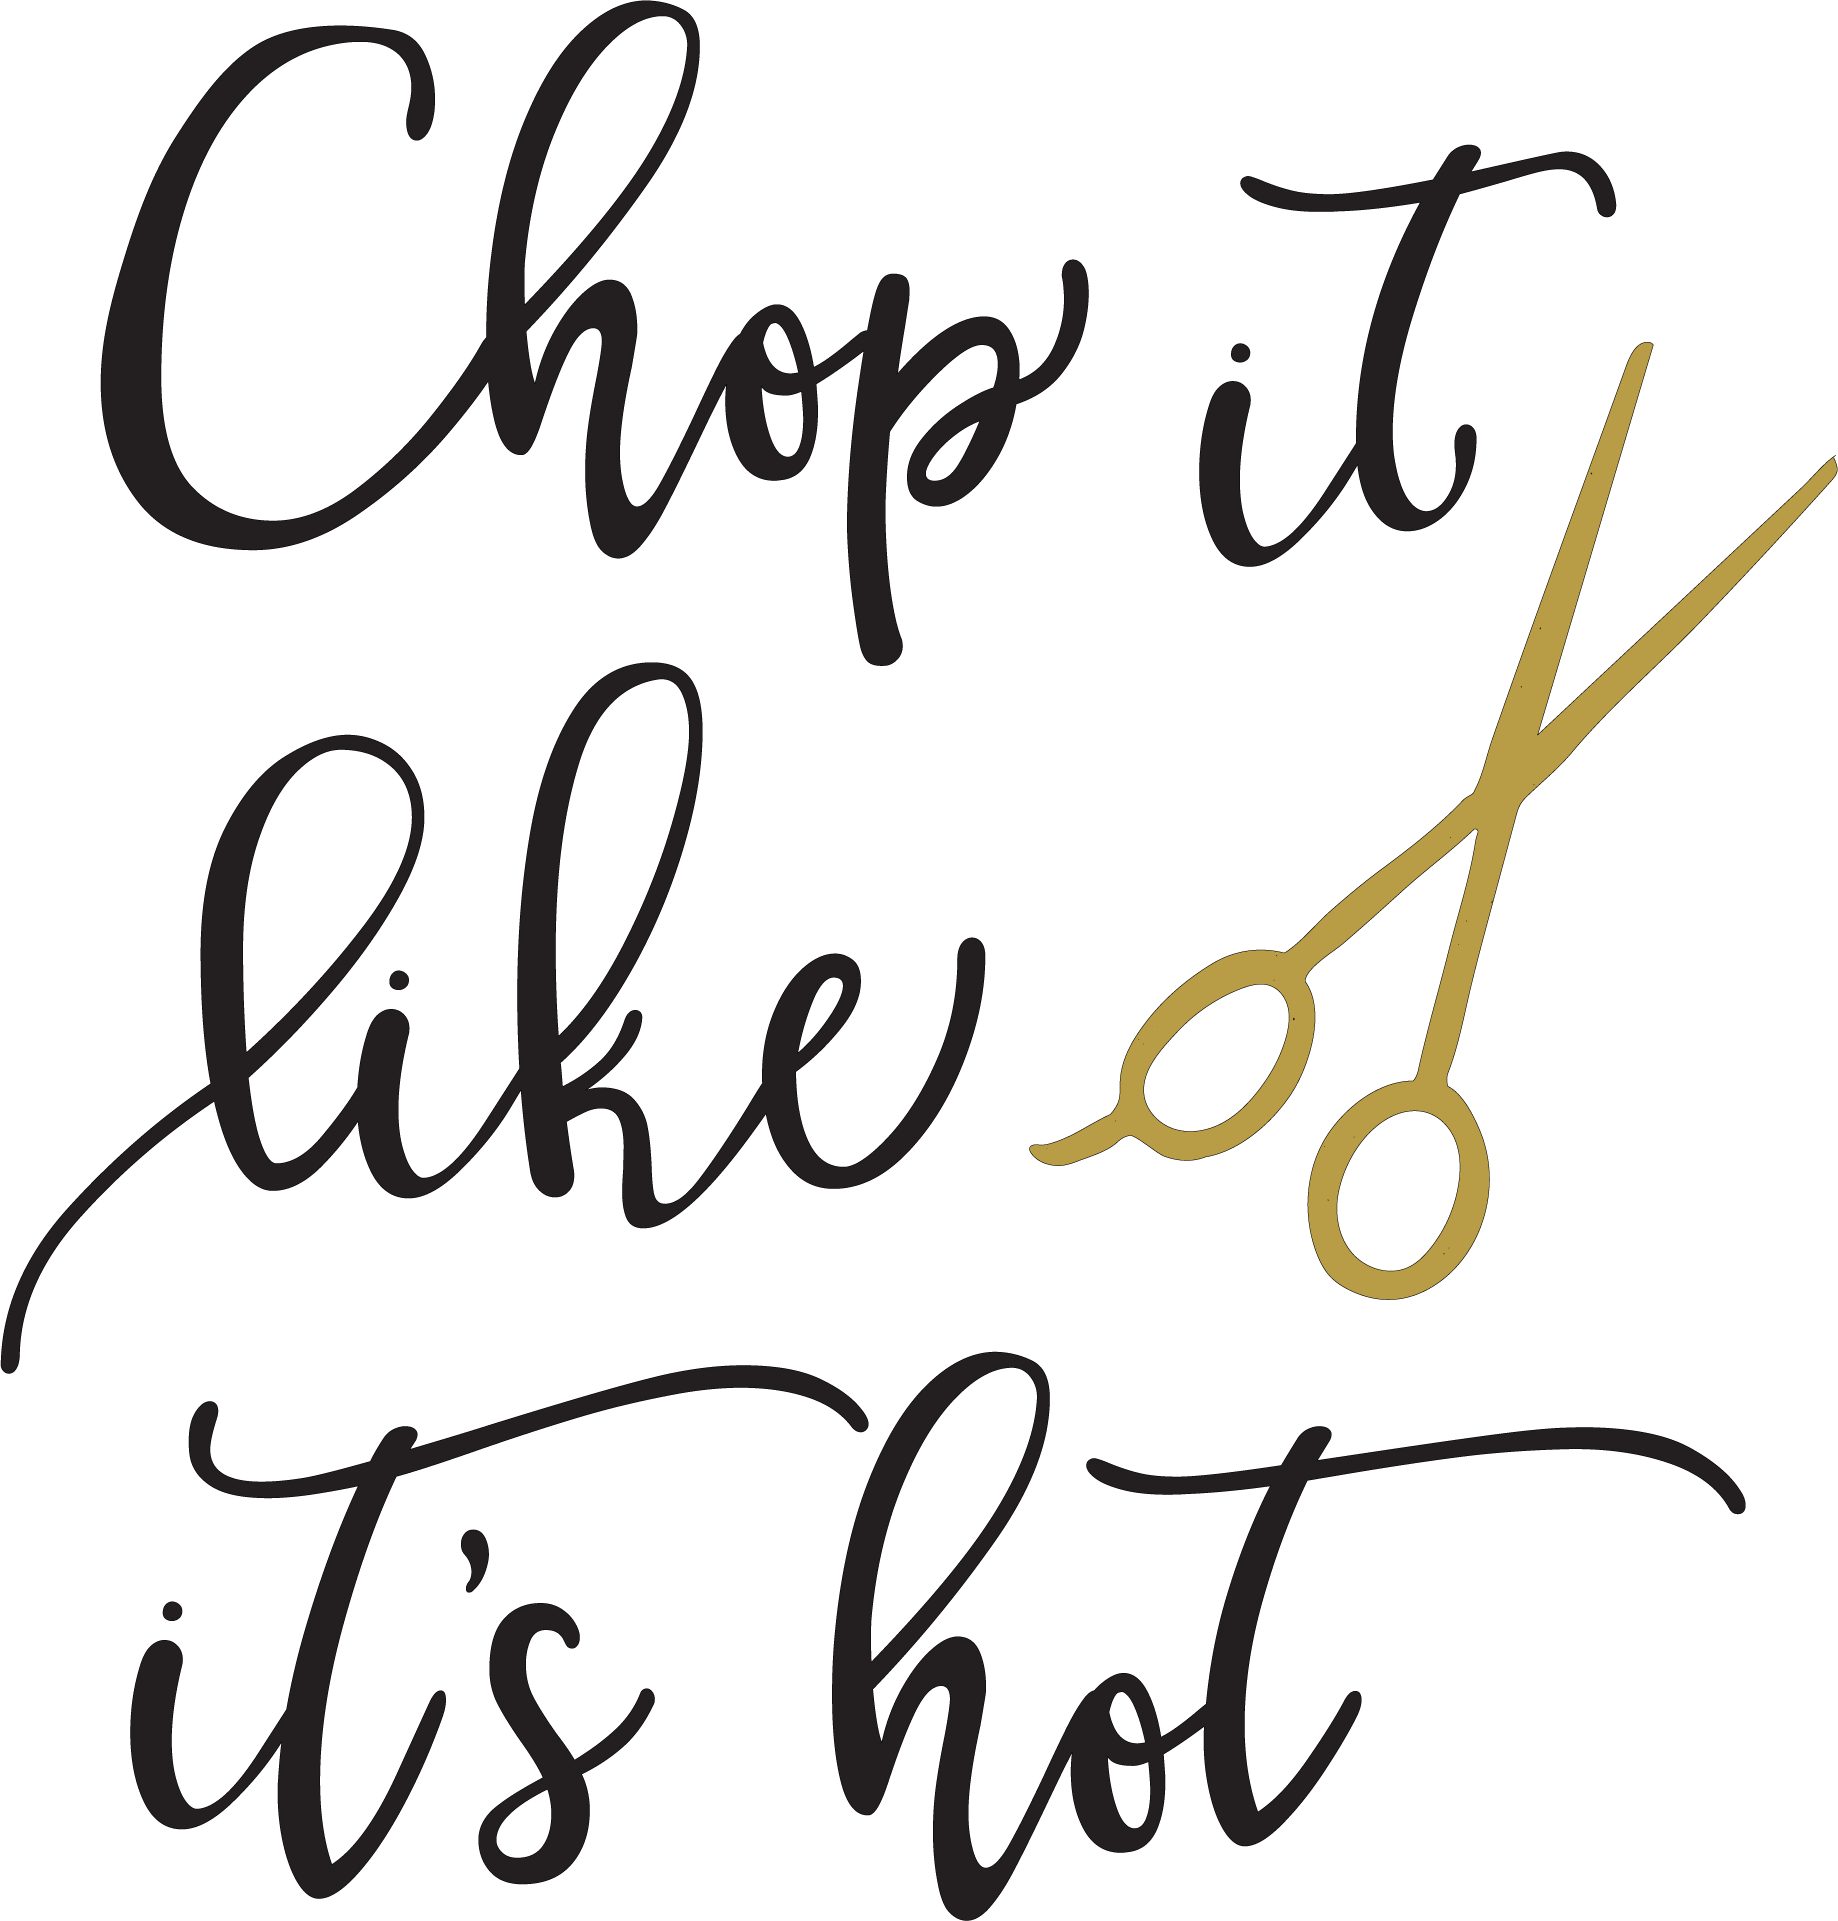 Chop It Like It's Hot SVG Cut File